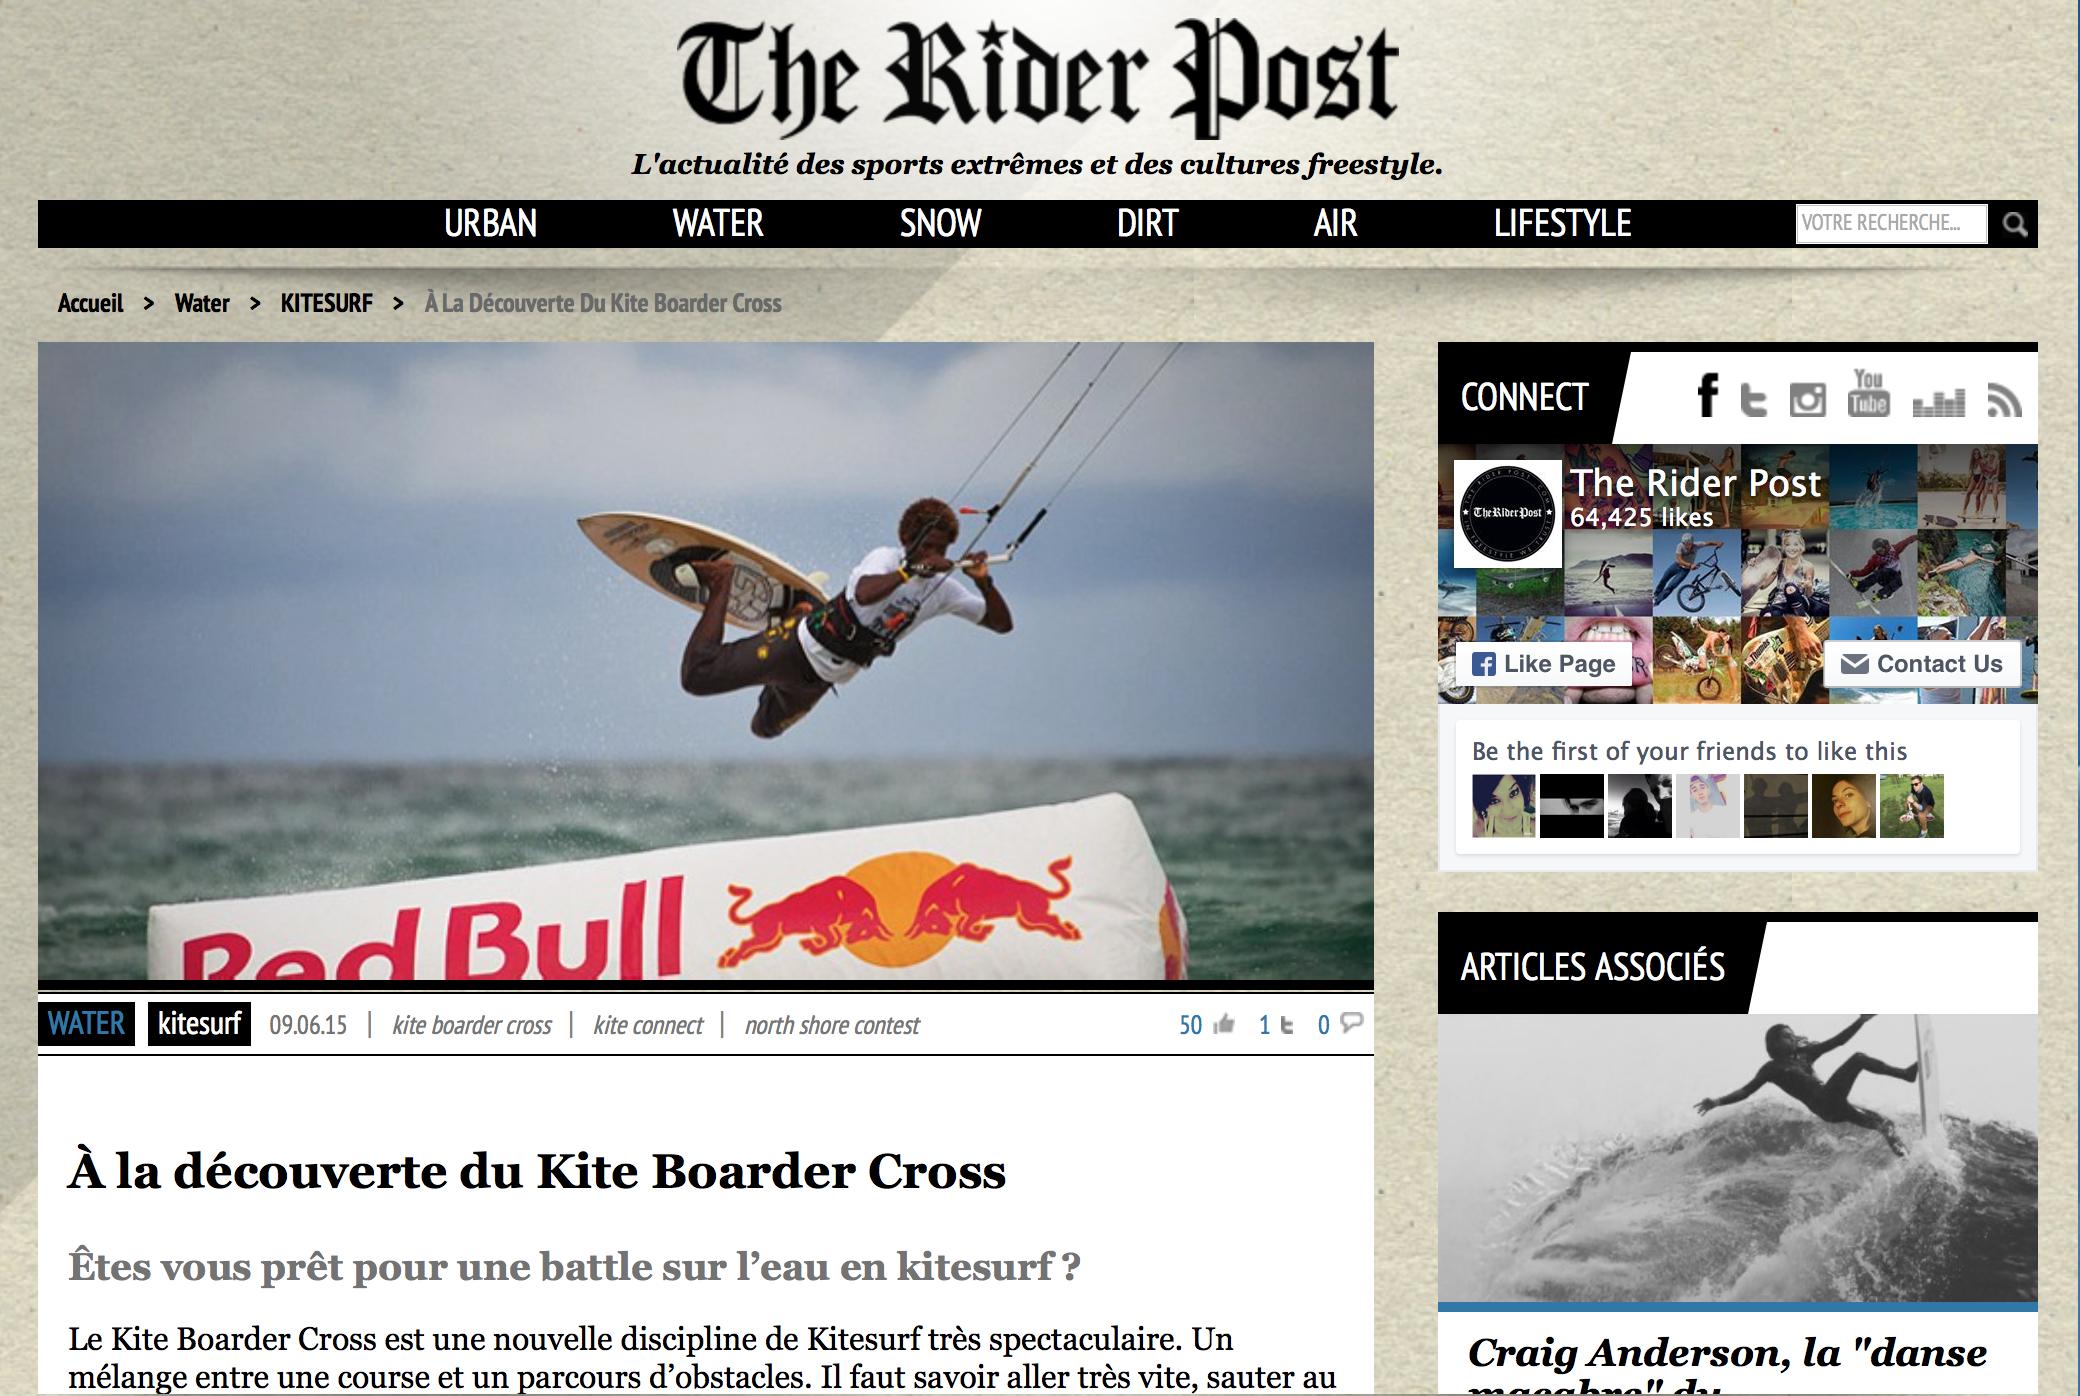 The Rider Post